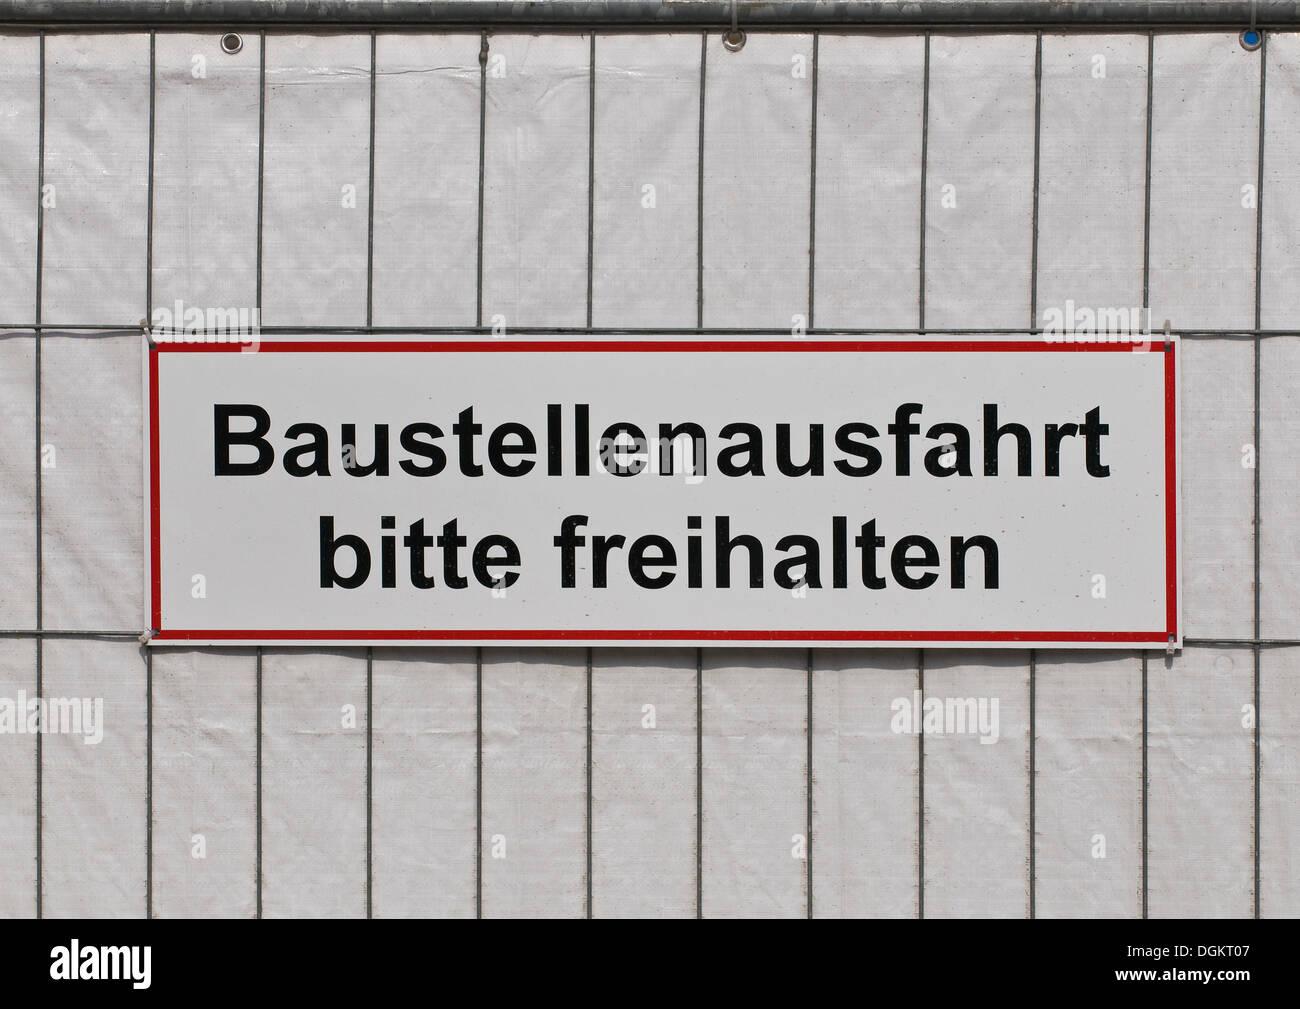 Sign on a fence, Baustellenausfahrt bitte freihalten, exit please keep clear - Stock Image